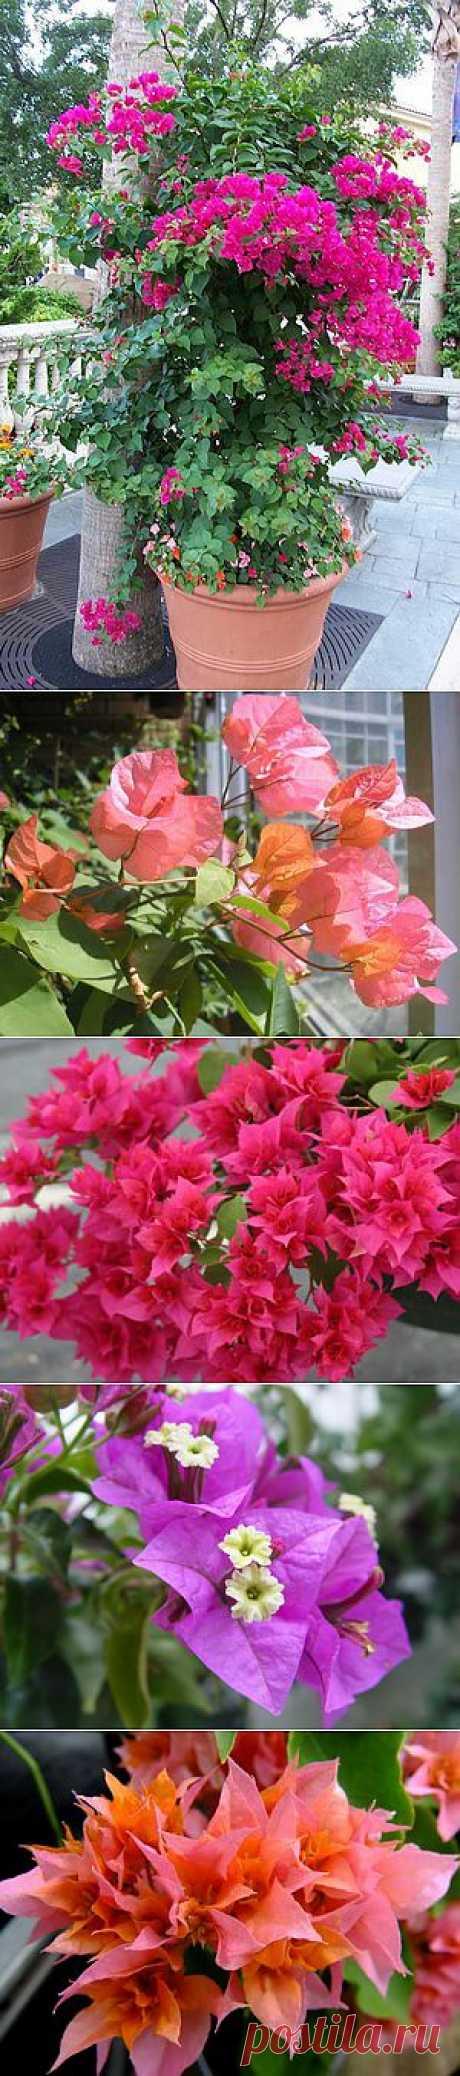 Цветок бугенвилия комнатная и для сада: фото, описание и уход. Все сорта бугенвилии - Александра, Элизабет и другие.